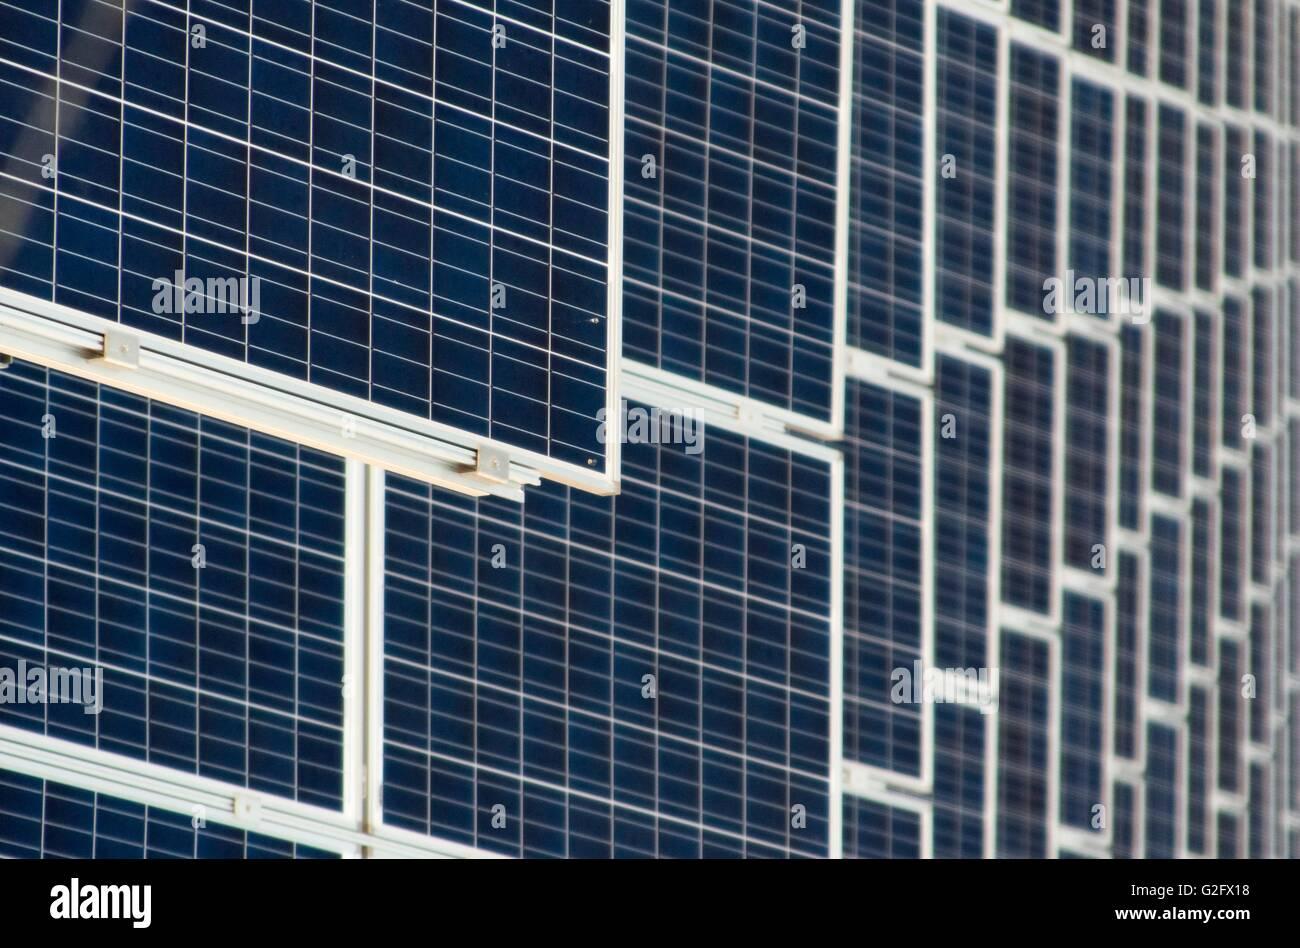 solars panels pattern - Stock Image